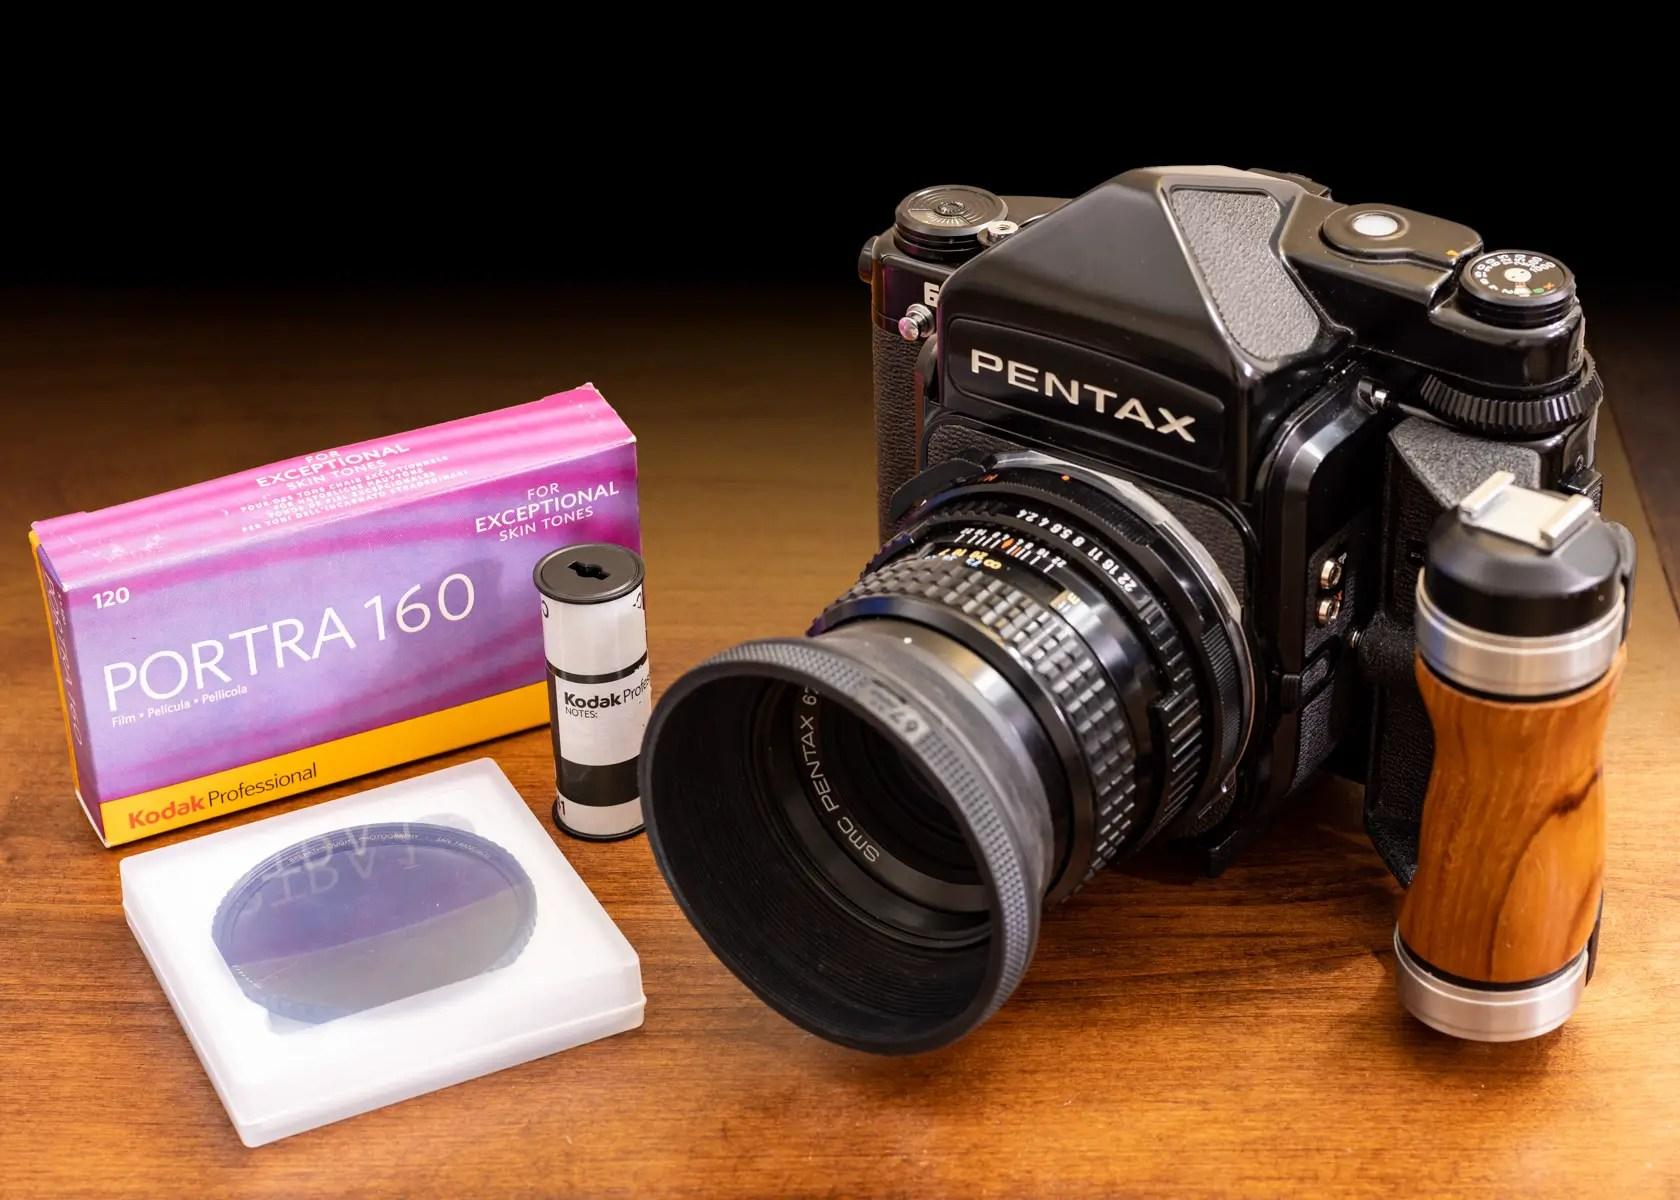 Pentax 67, SMC 105mm f/2.4 lens and Portra 16